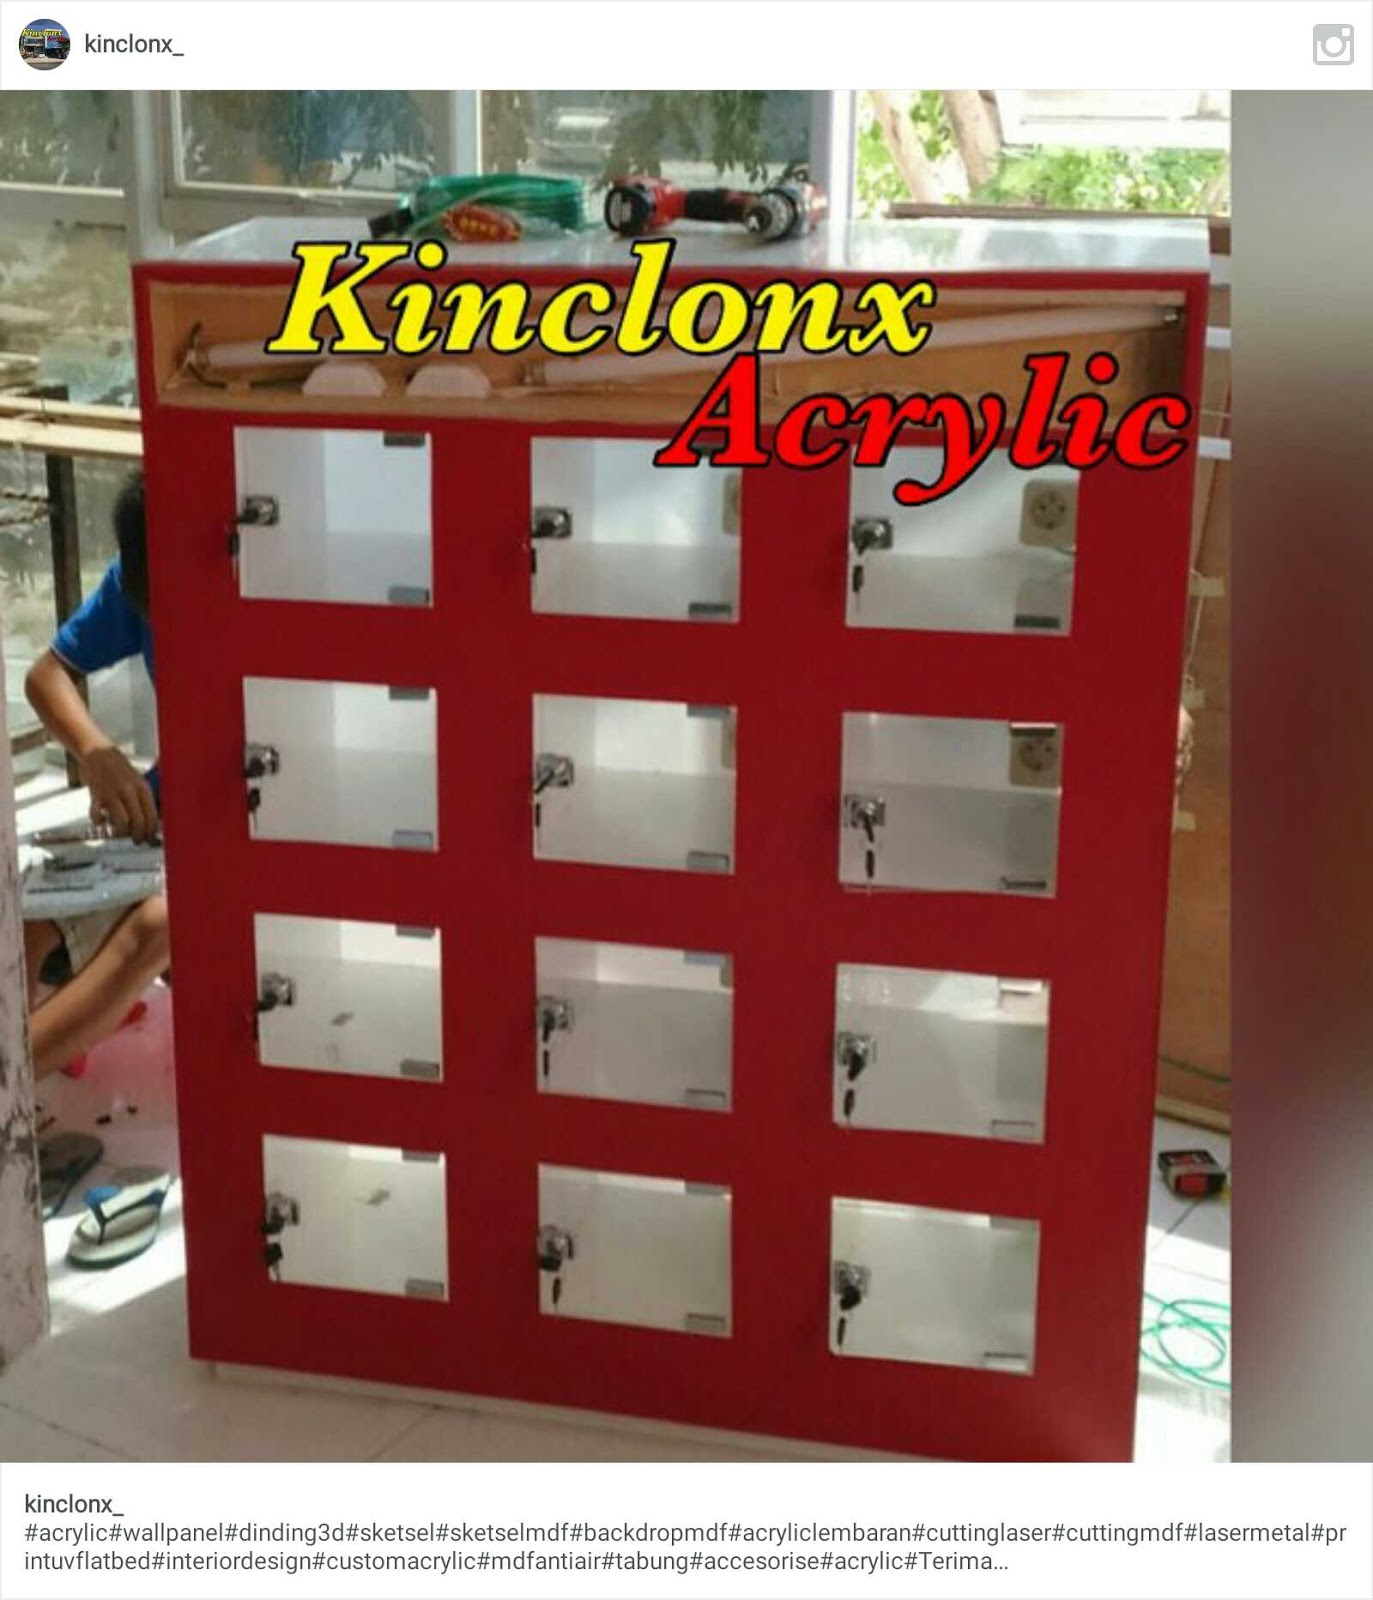 PT. KINCLONX ACRYLIC INDONESIA.: BOX CHARGER